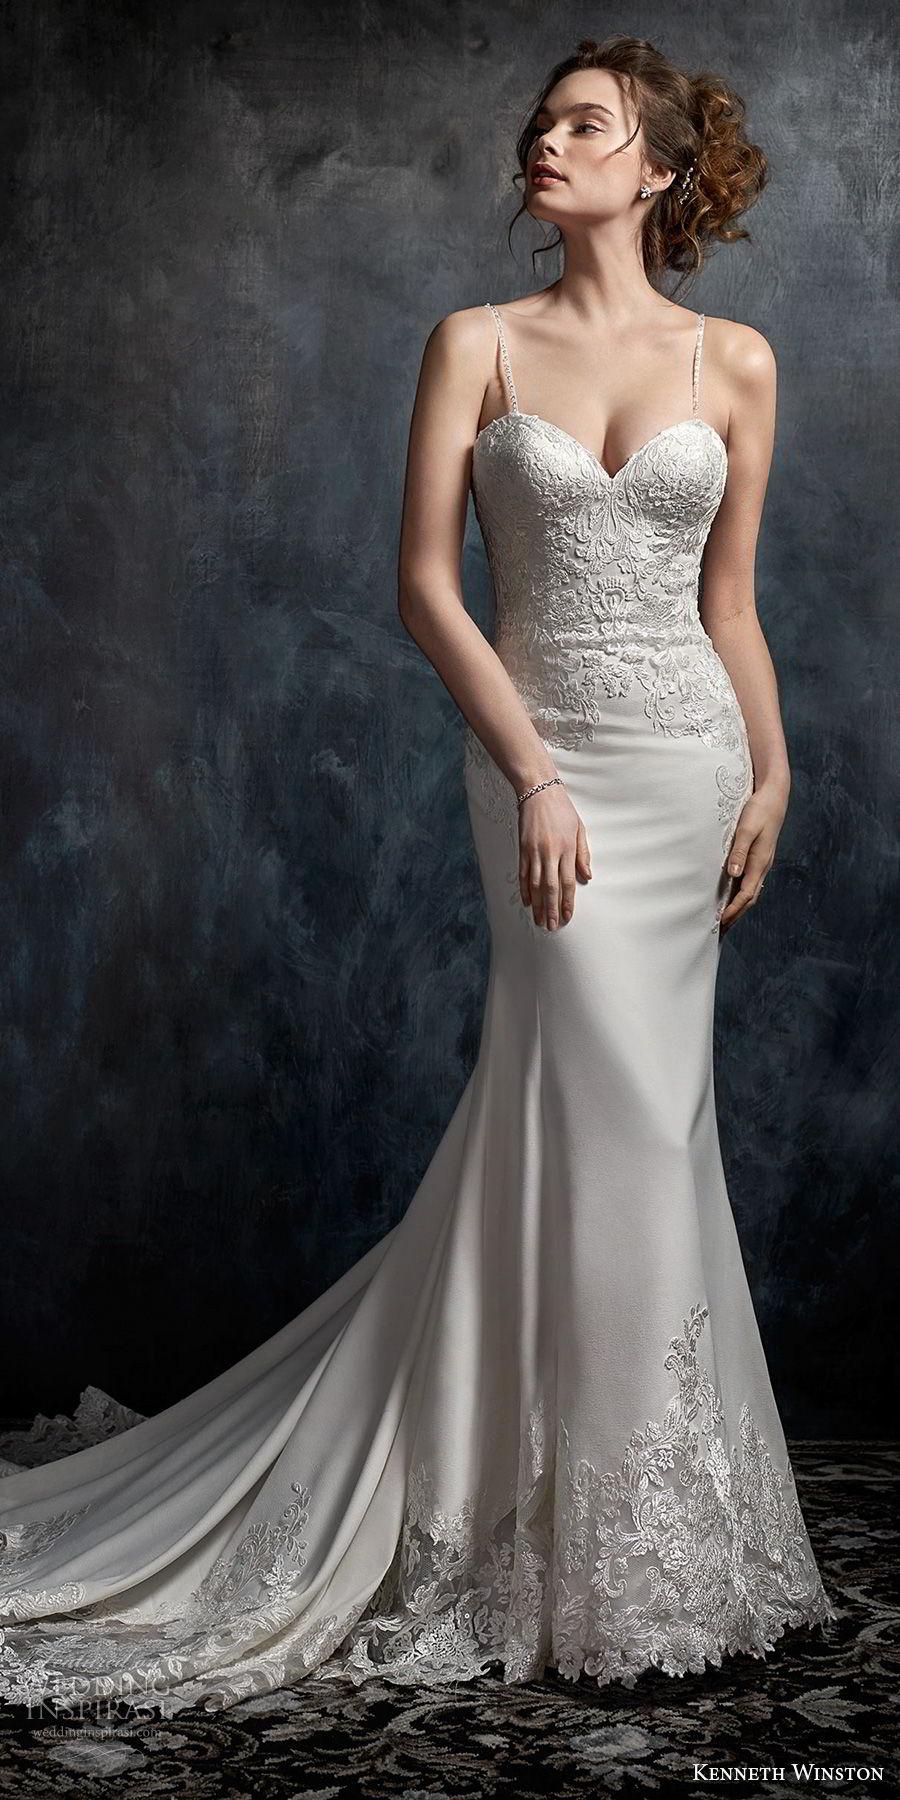 kenneth winston fall 2017 bridal spaghetti strap sweetheart neckline heavily embellished bodice elegant sheath wedding dress chapel train (29) fv